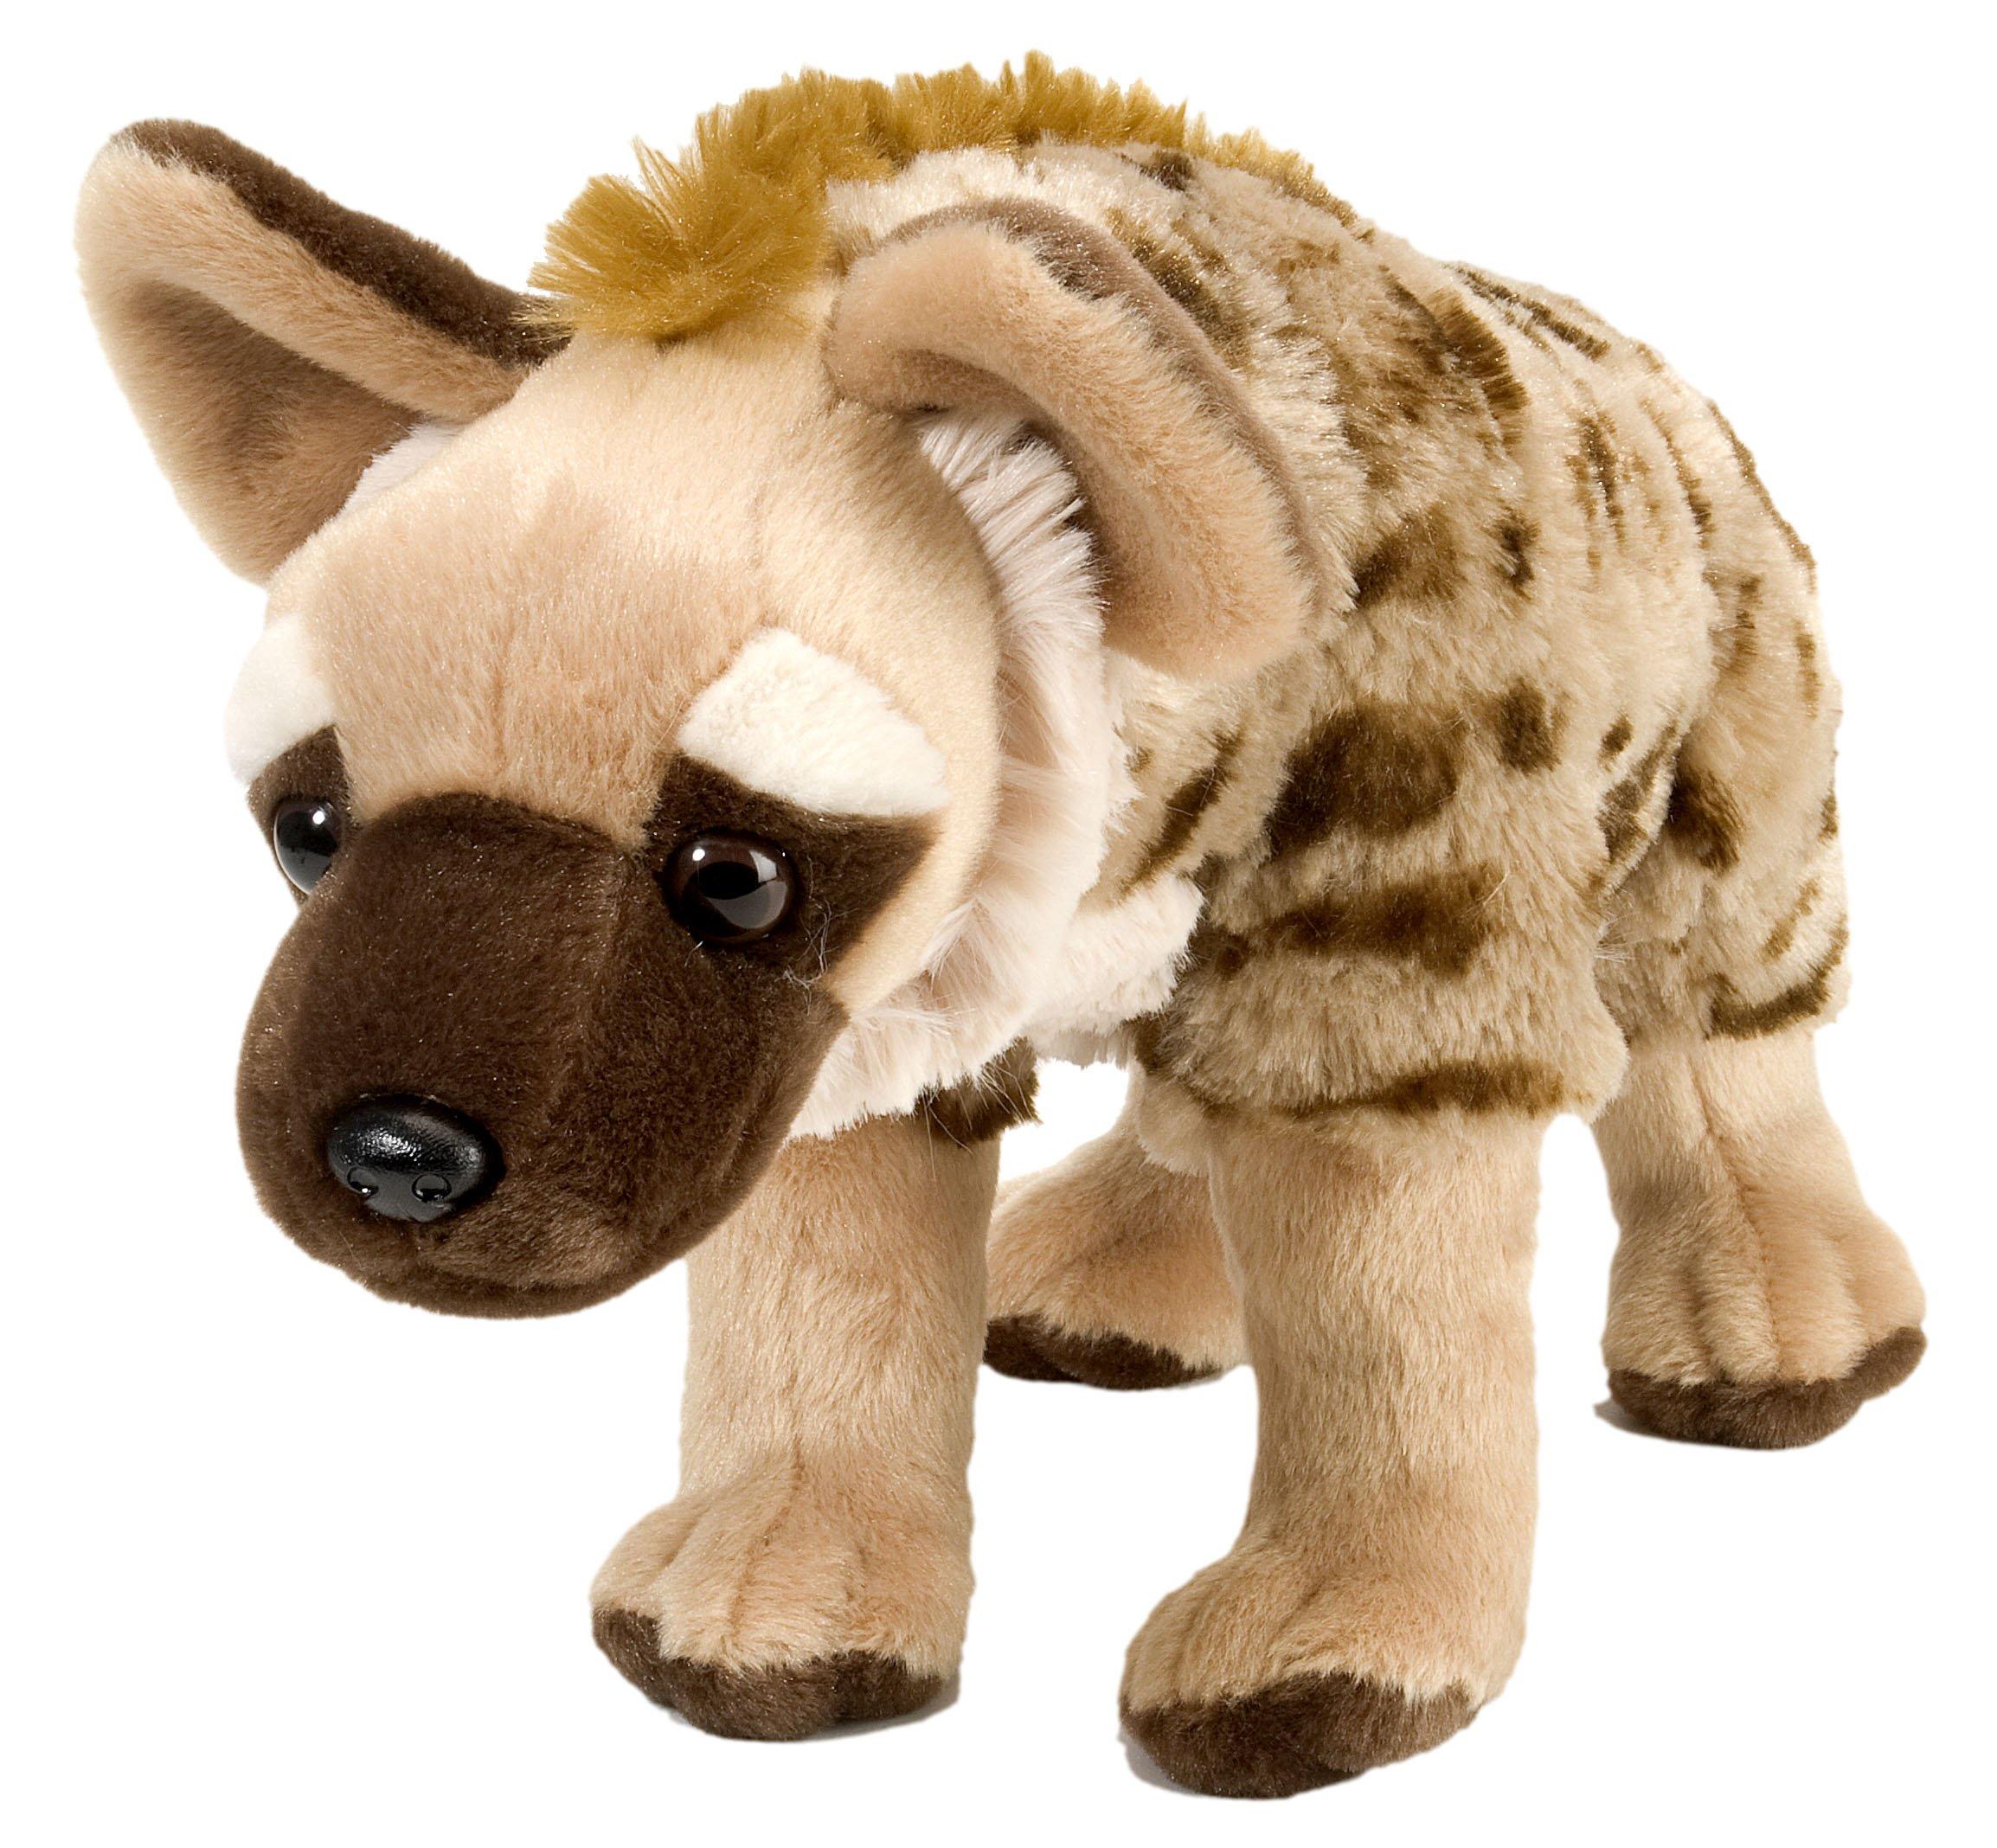 "Wild Republic Hyena Stuffed Animal, Plush Toy, Gifts for Kids, Cuddlekins 12"", Multicolor (12240)"